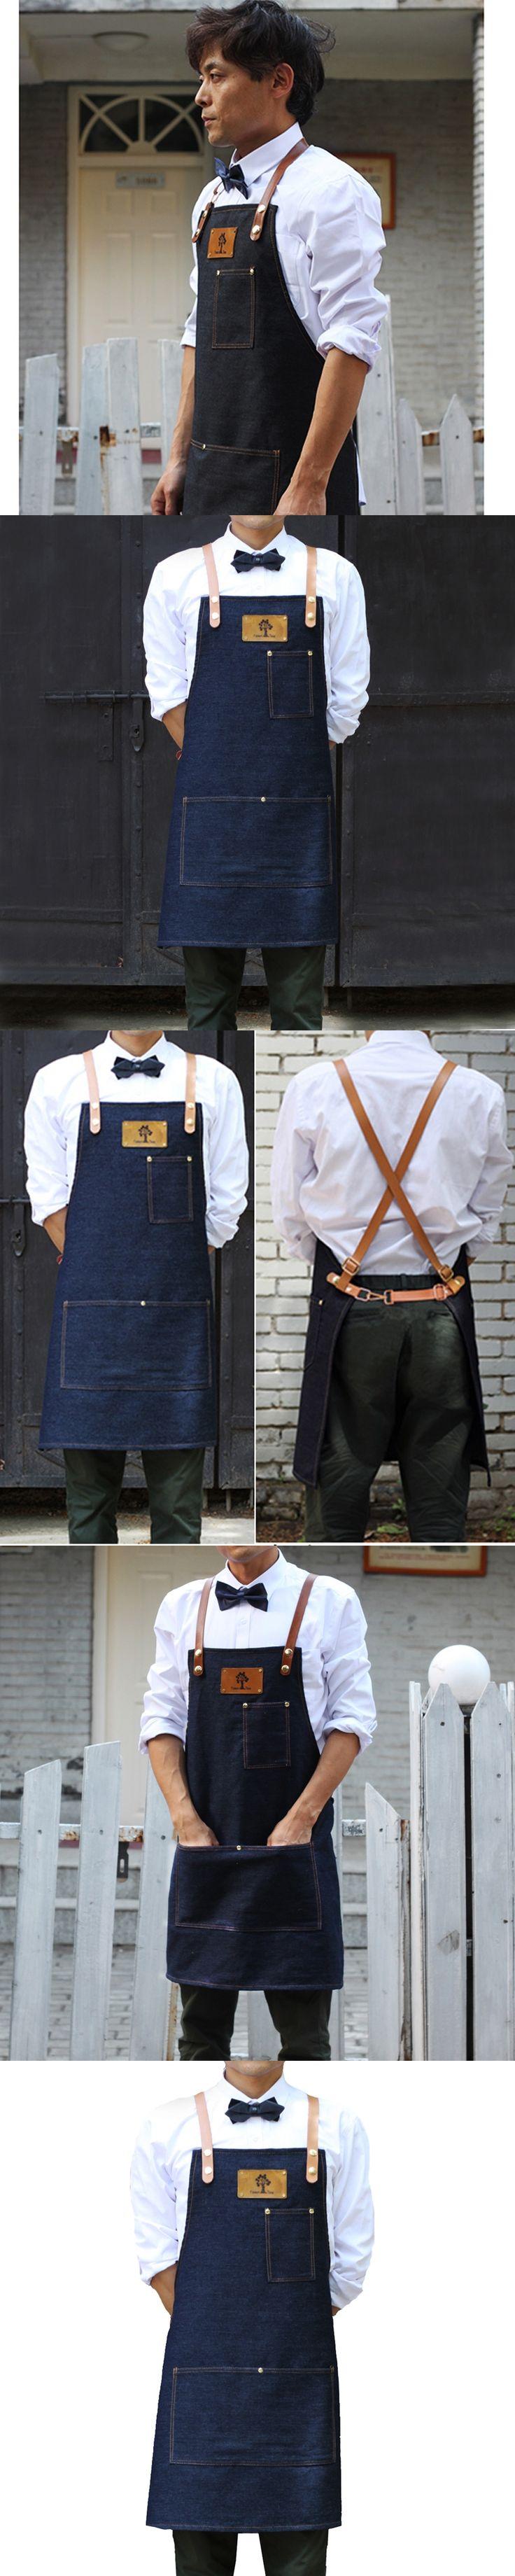 Senior Denim cowboy BBQ Apron Bib Leather Straps Kitchen Apron for Women Men House cooking Restaurant Waitress Custom Print Logo